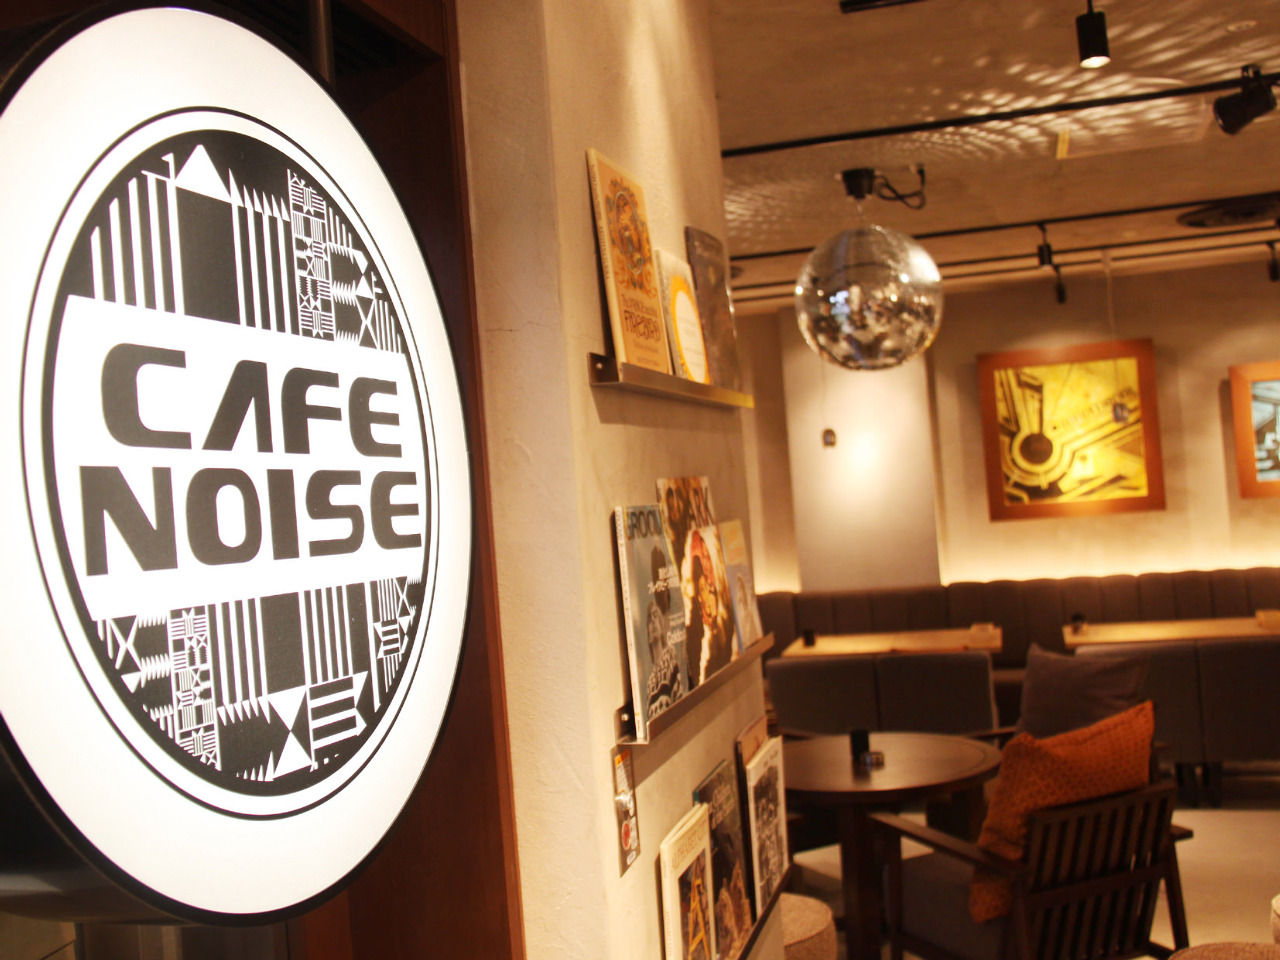 【cafe noise 貸切ビュッフェパーティープラン【2時間飲み放題付き】3500円(税別)